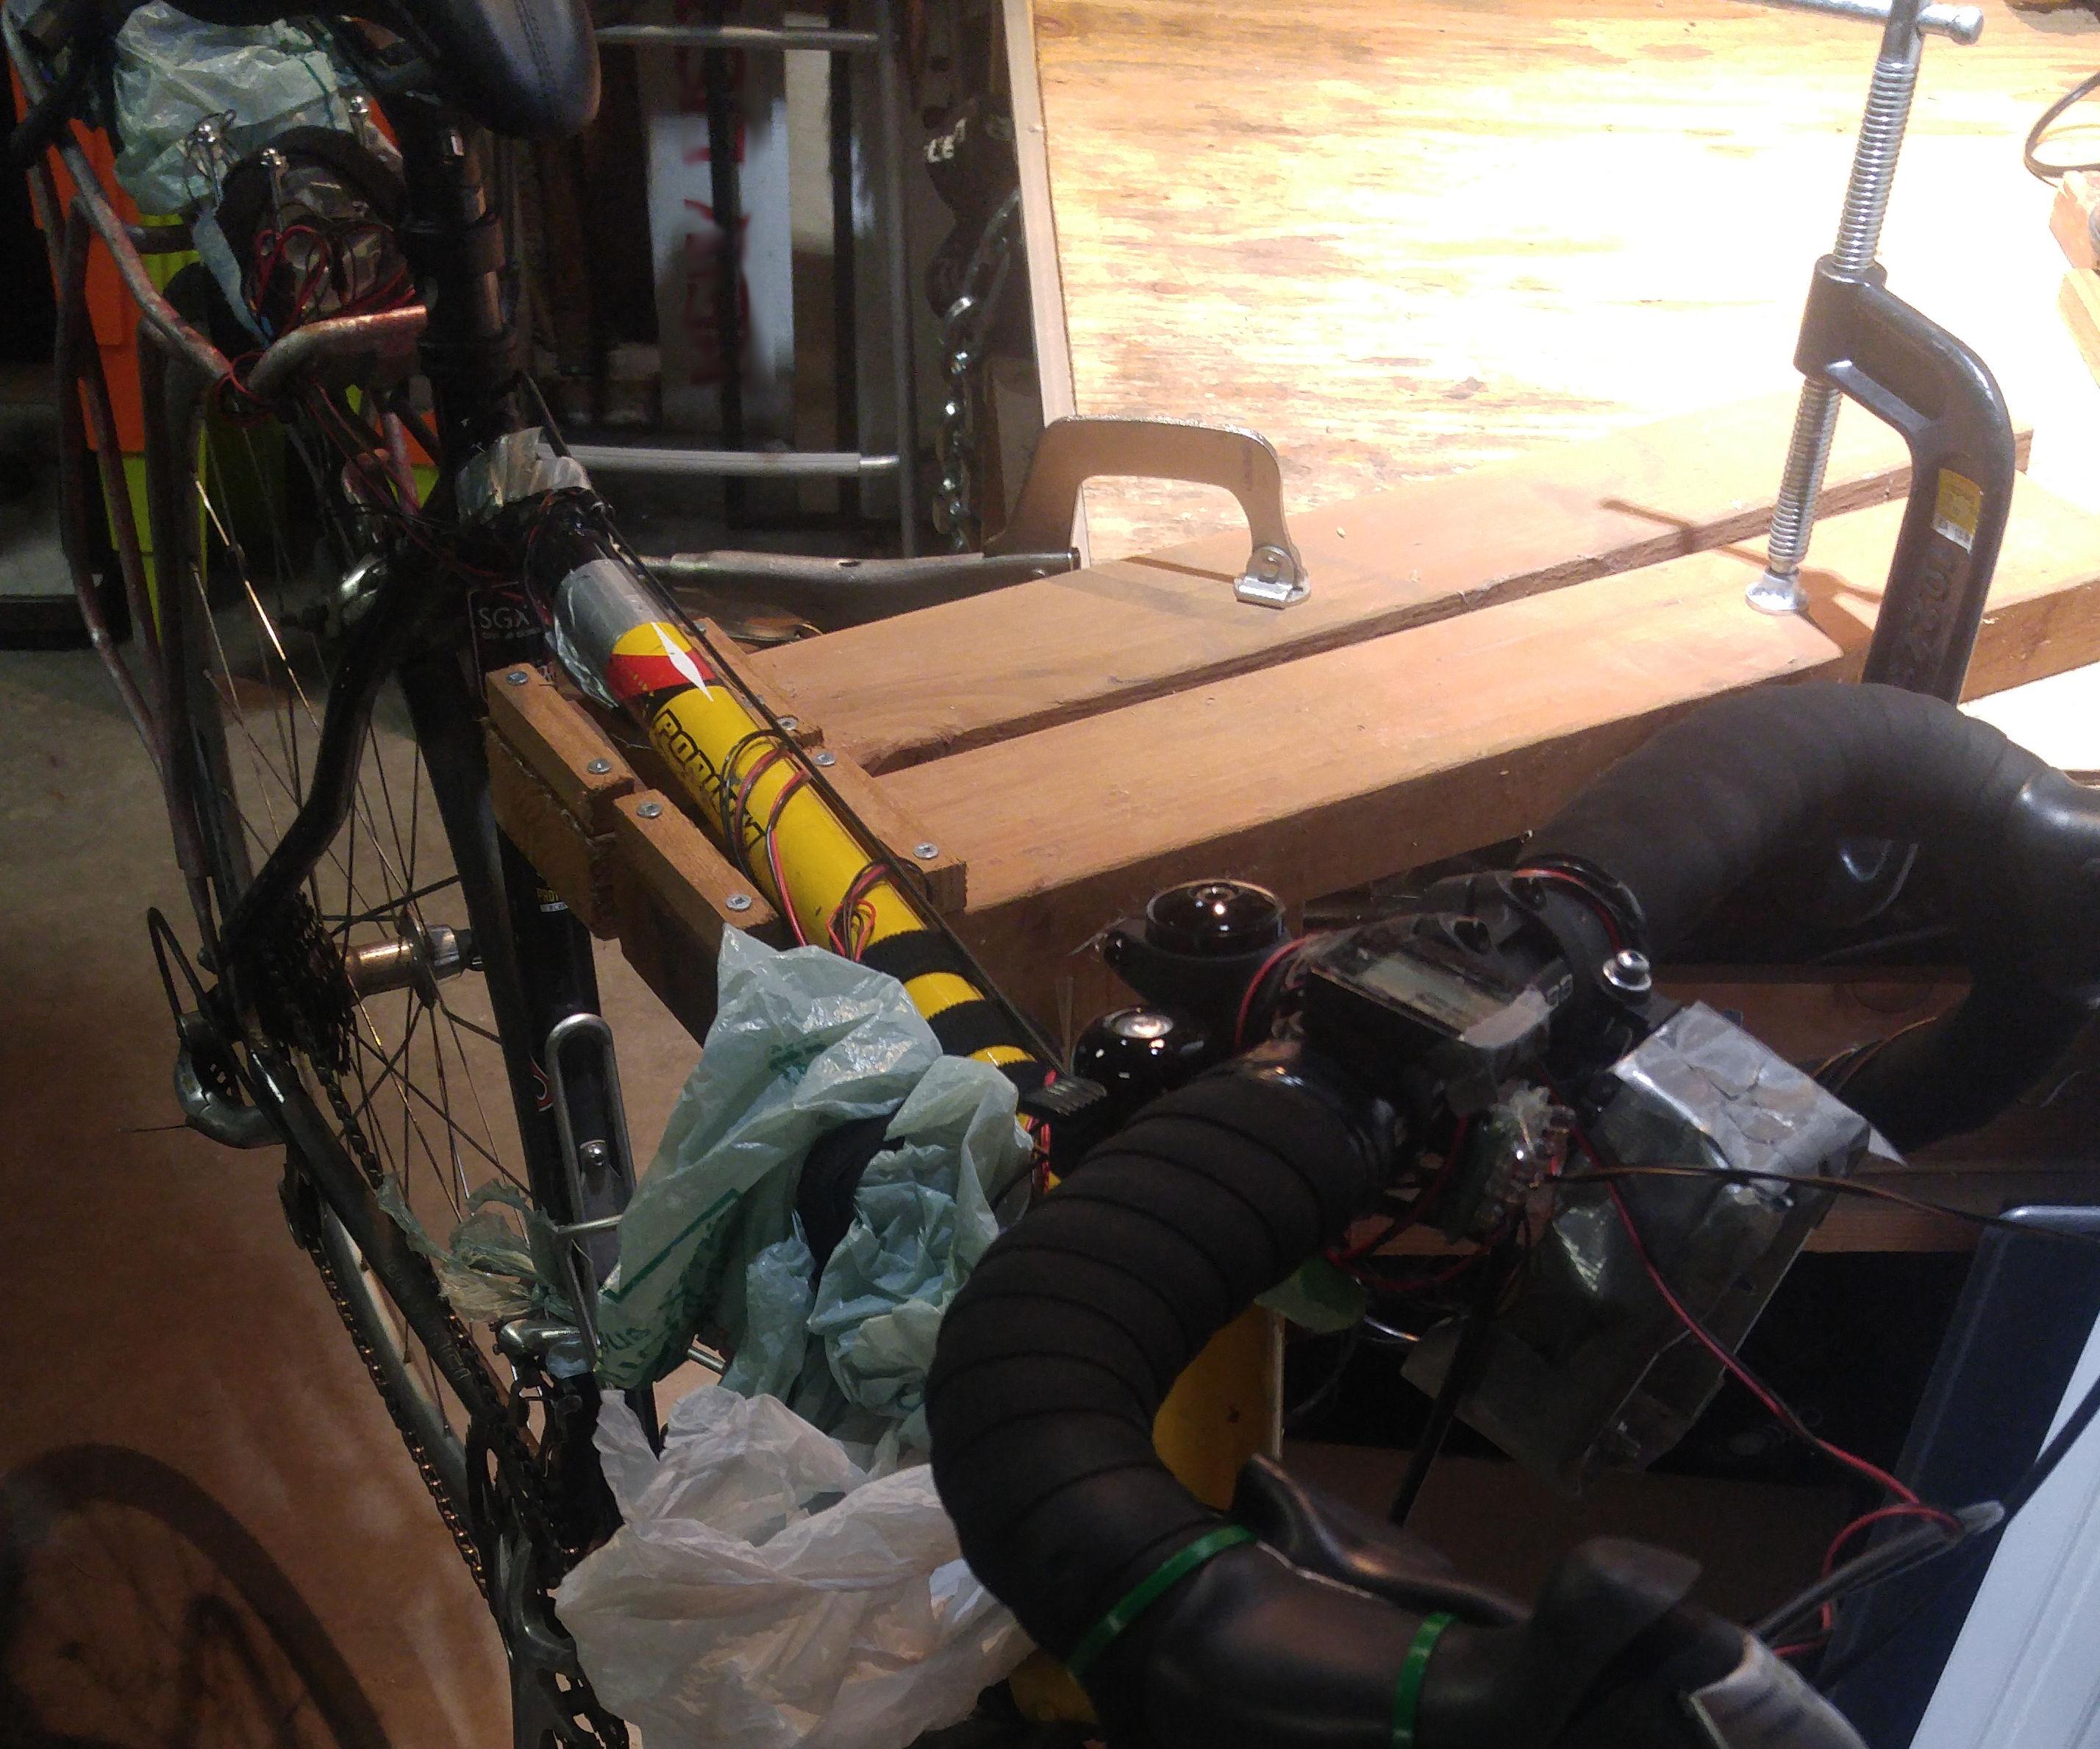 DIY Workbench Removable Bike Repair Stand